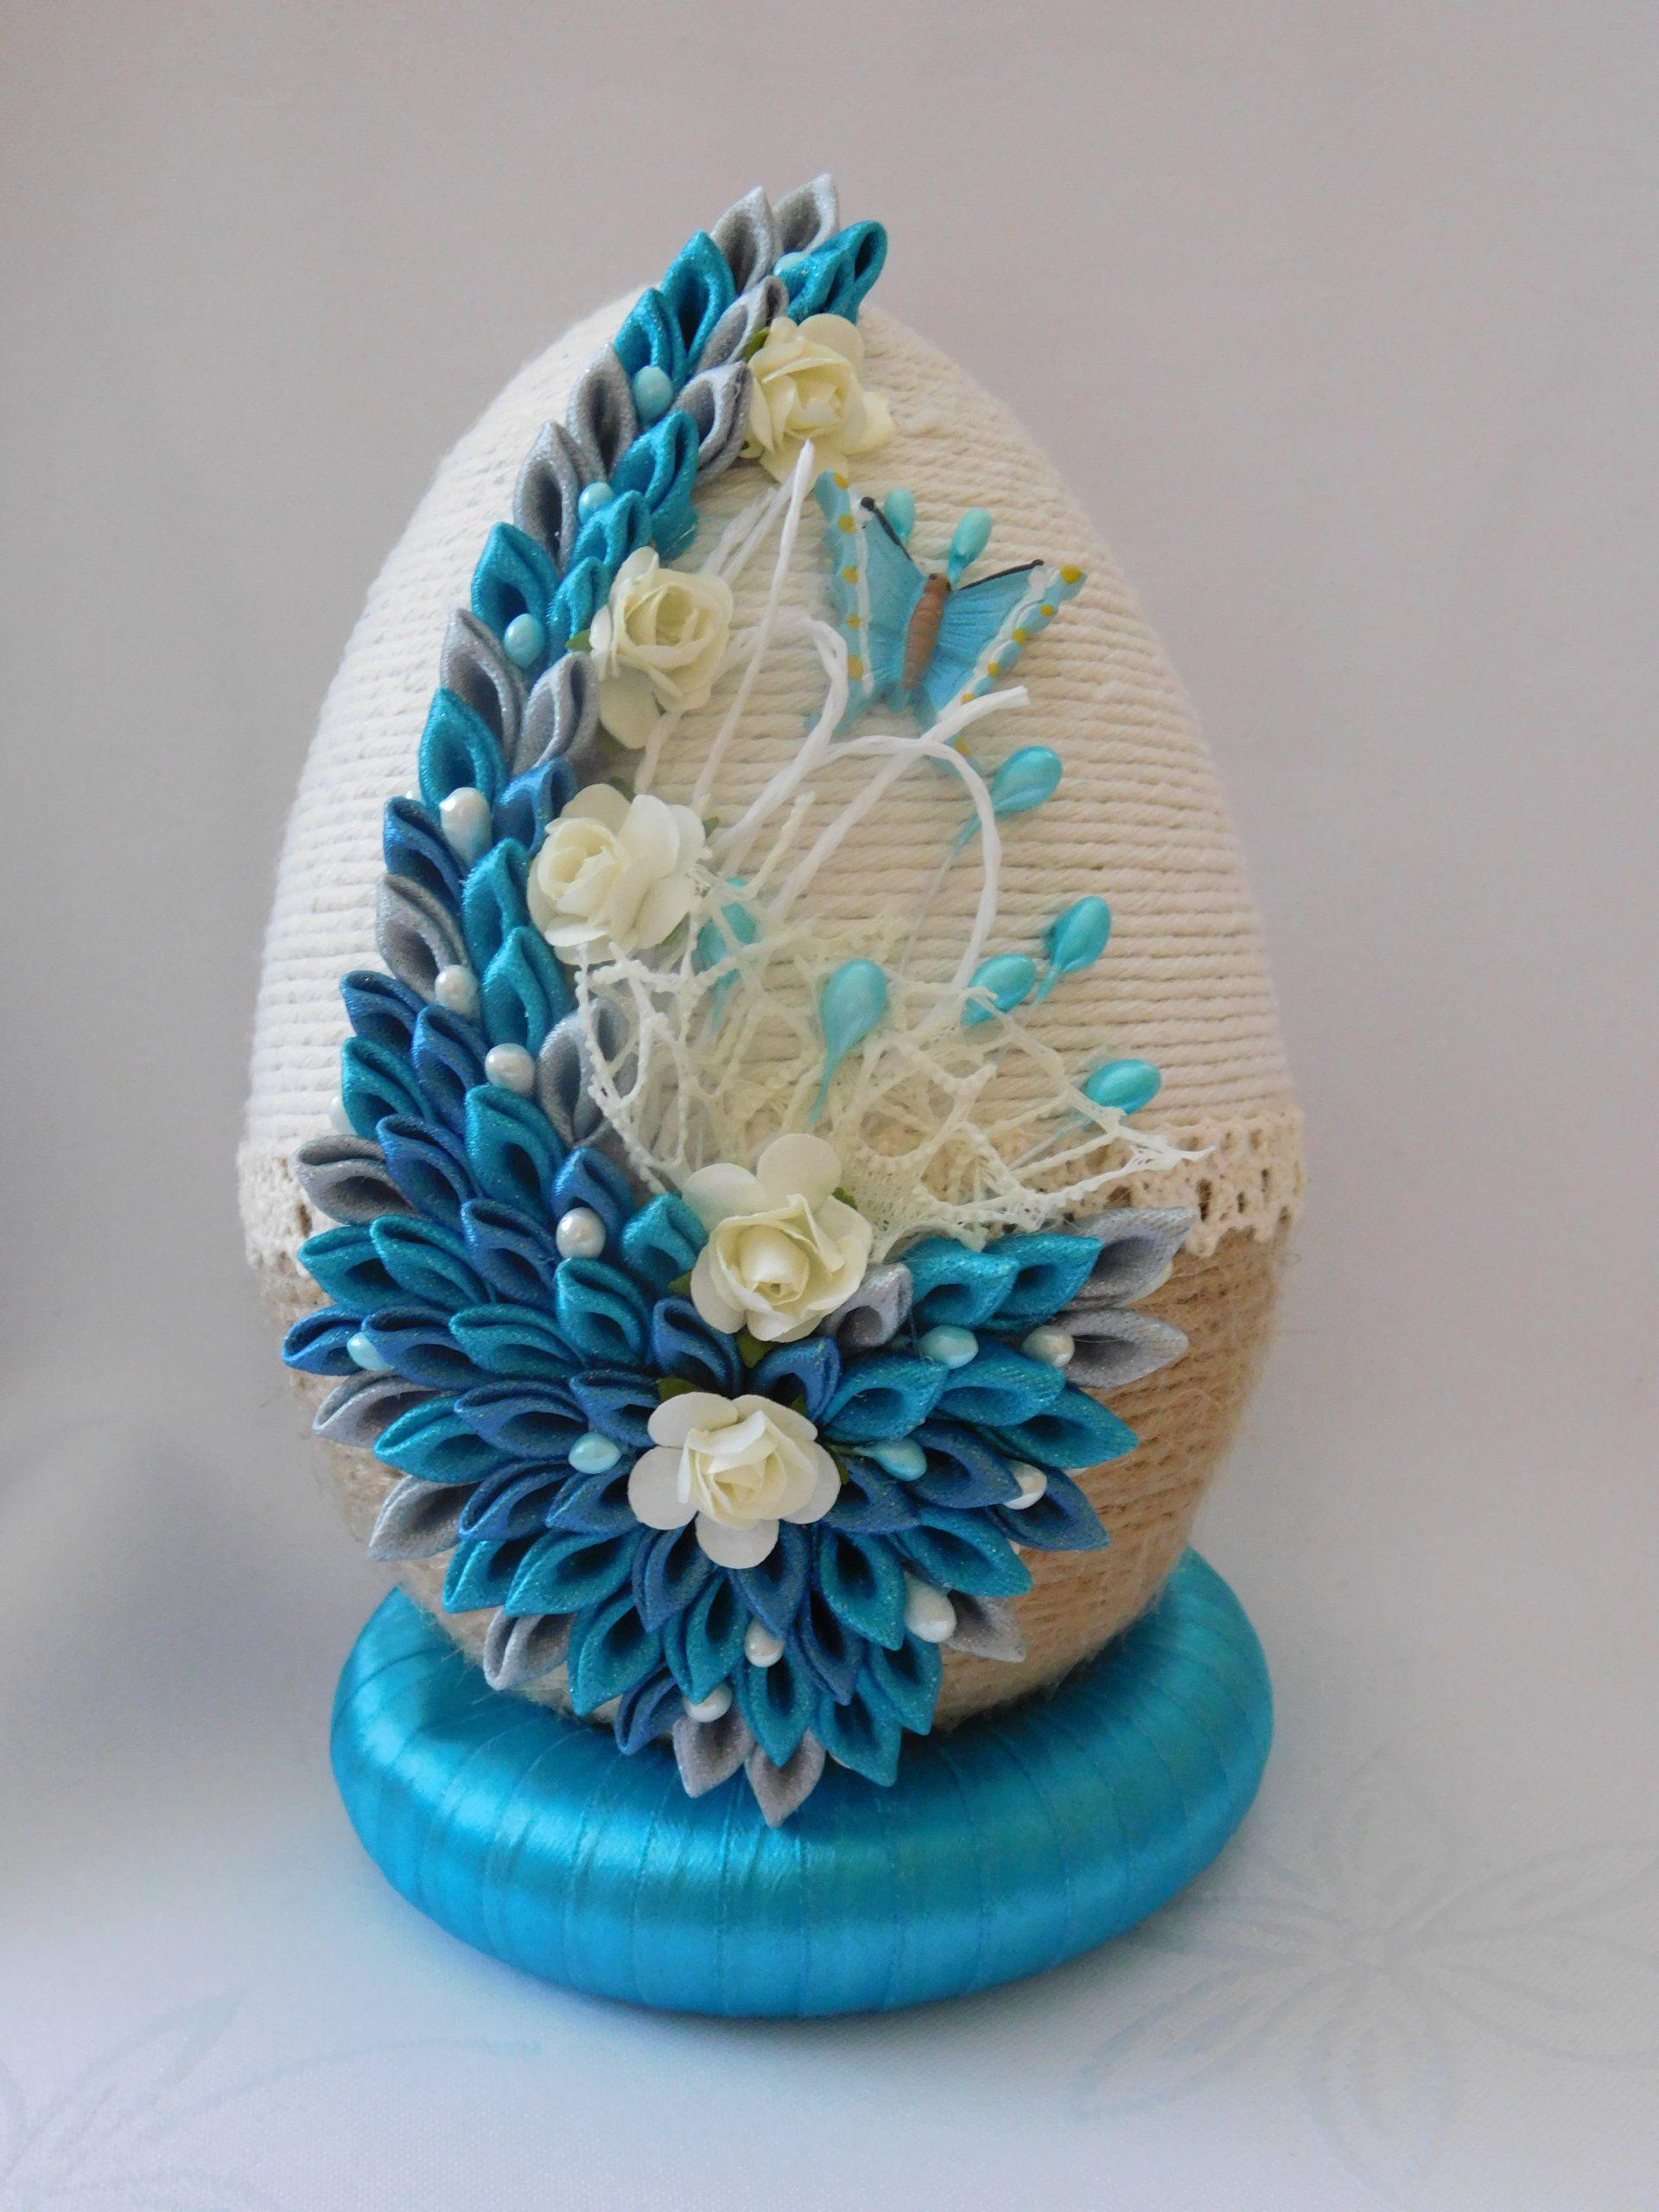 Allegro Crafts Easter Eggs Easter Egg Decorating